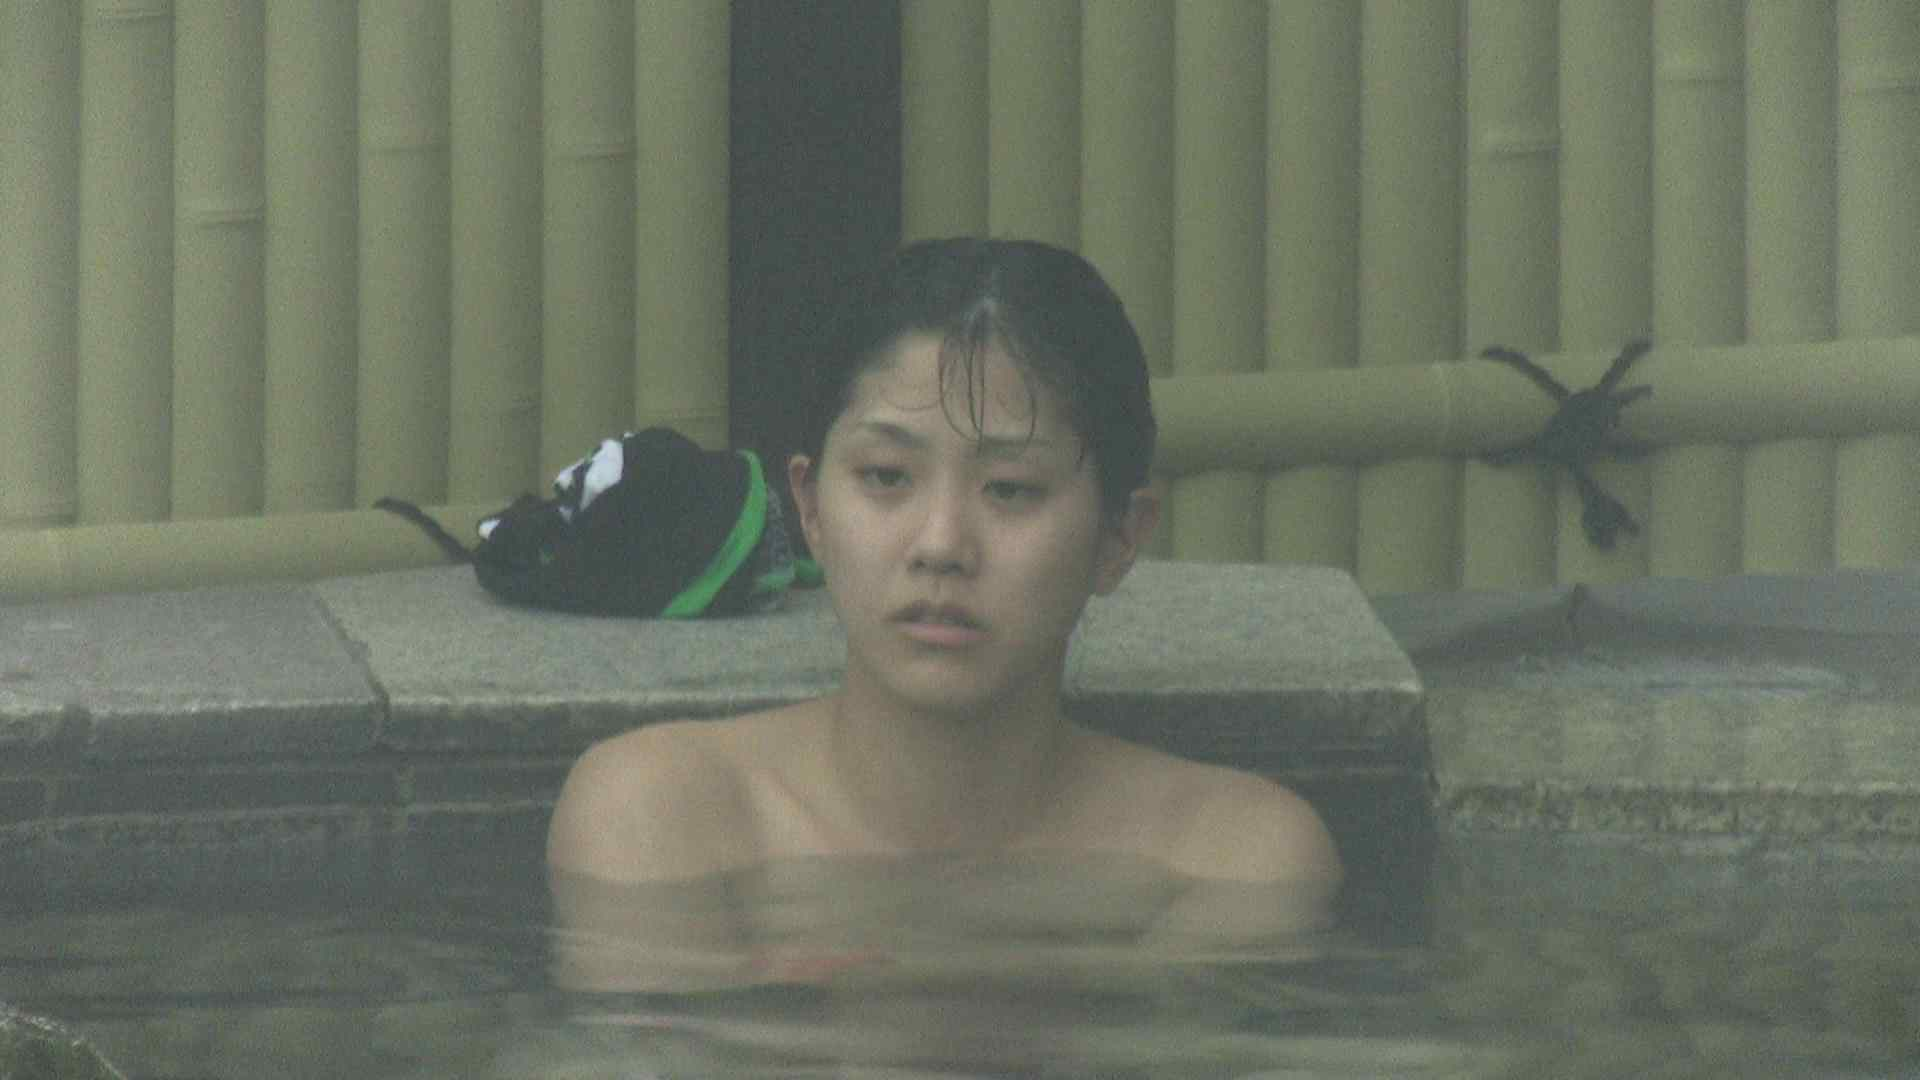 Aquaな露天風呂Vol.174 盗撮大放出 オマンコ無修正動画無料 97連発 66